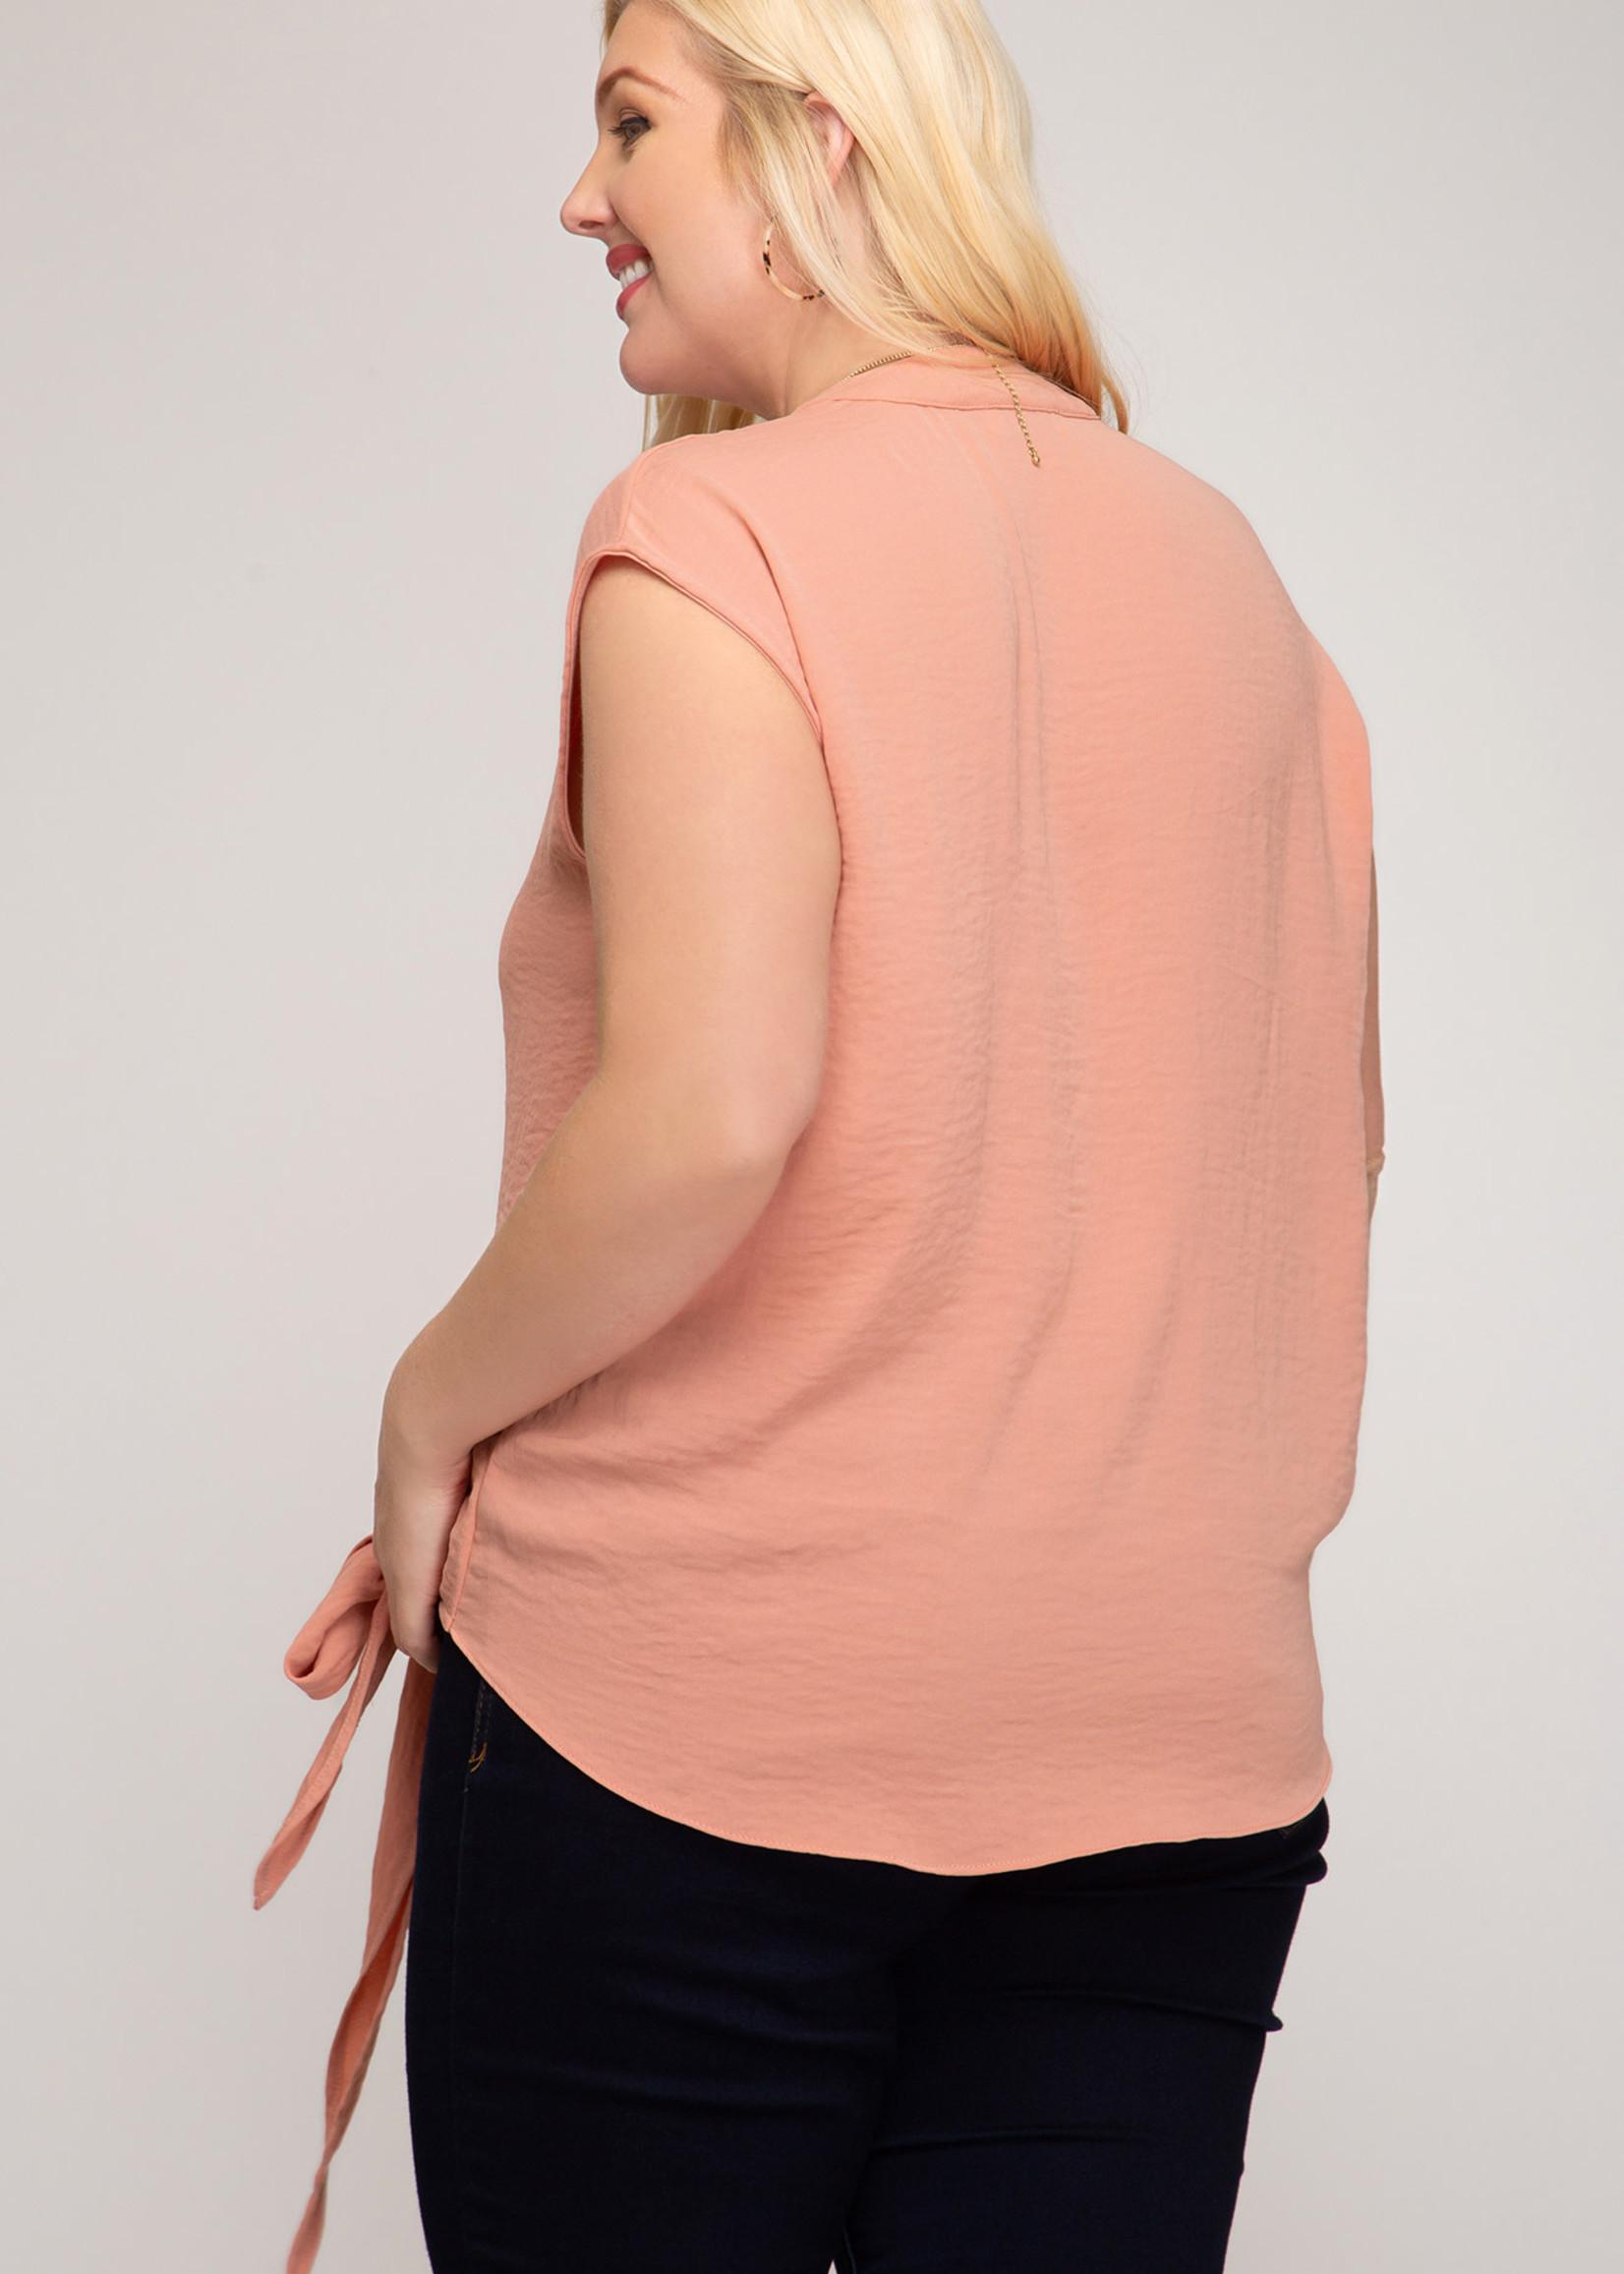 Sleeveless Surplice Top w/Front Side Tie Detail